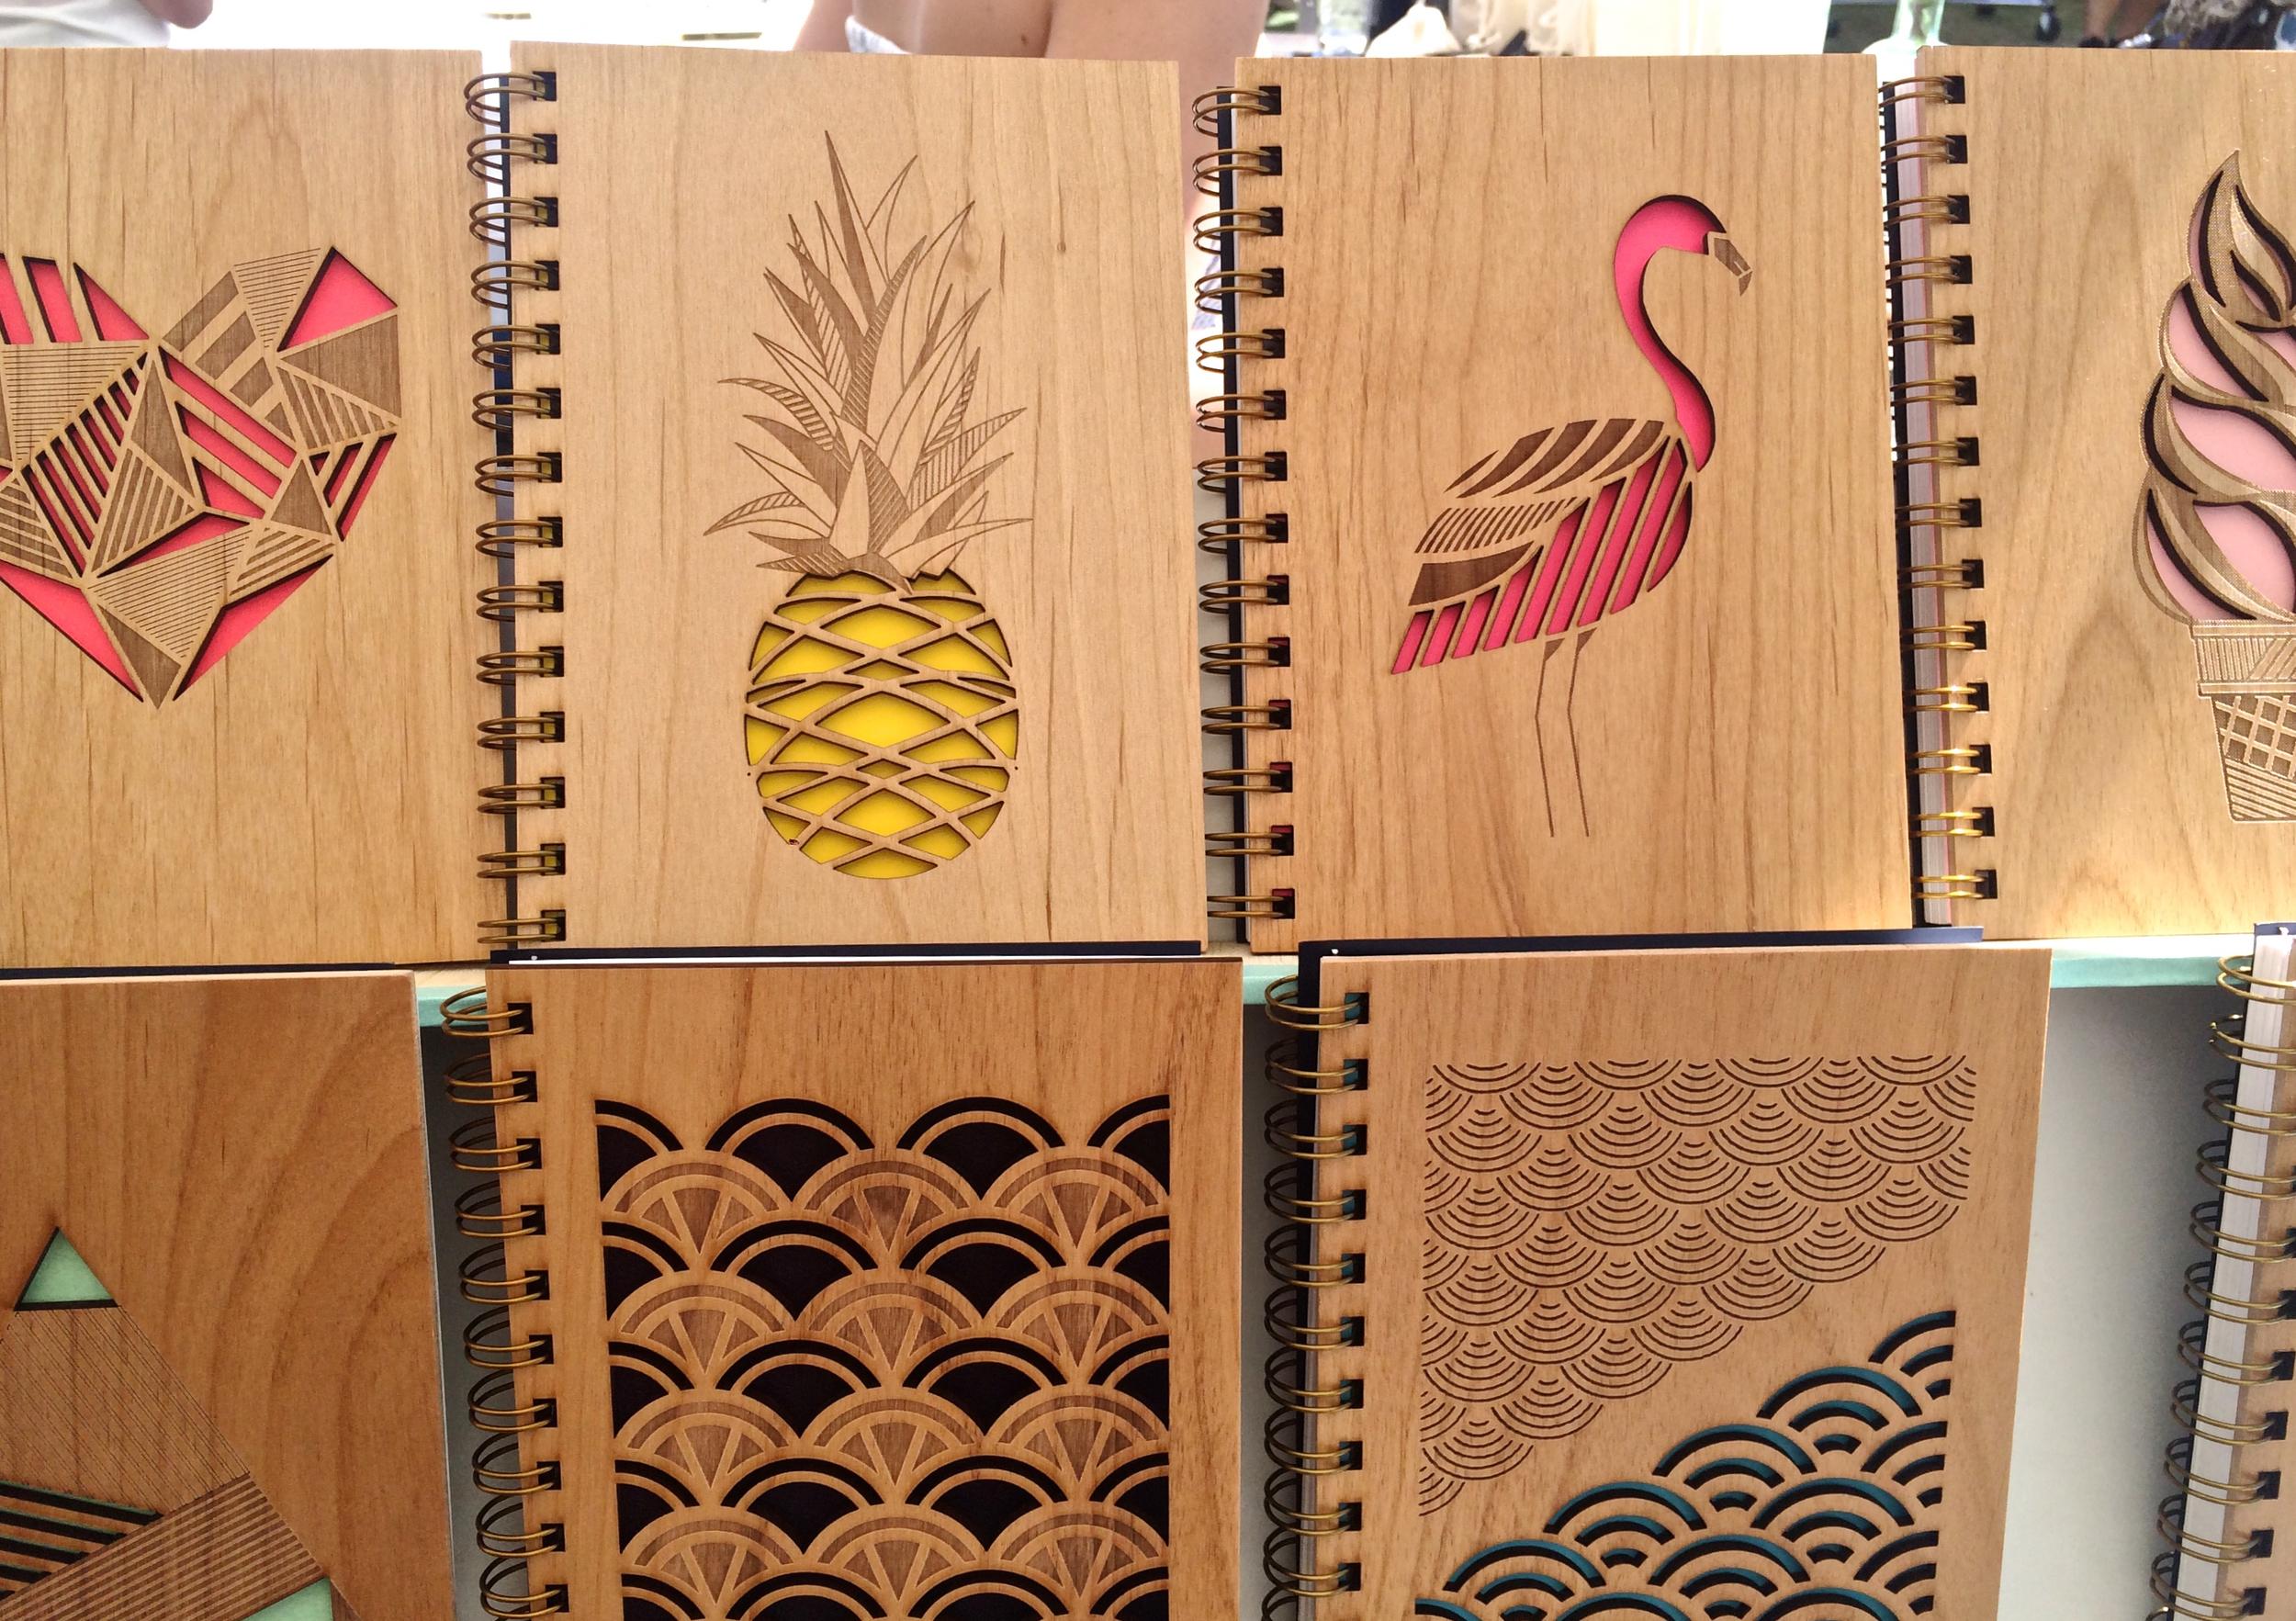 renegade-craft-fair.jpg